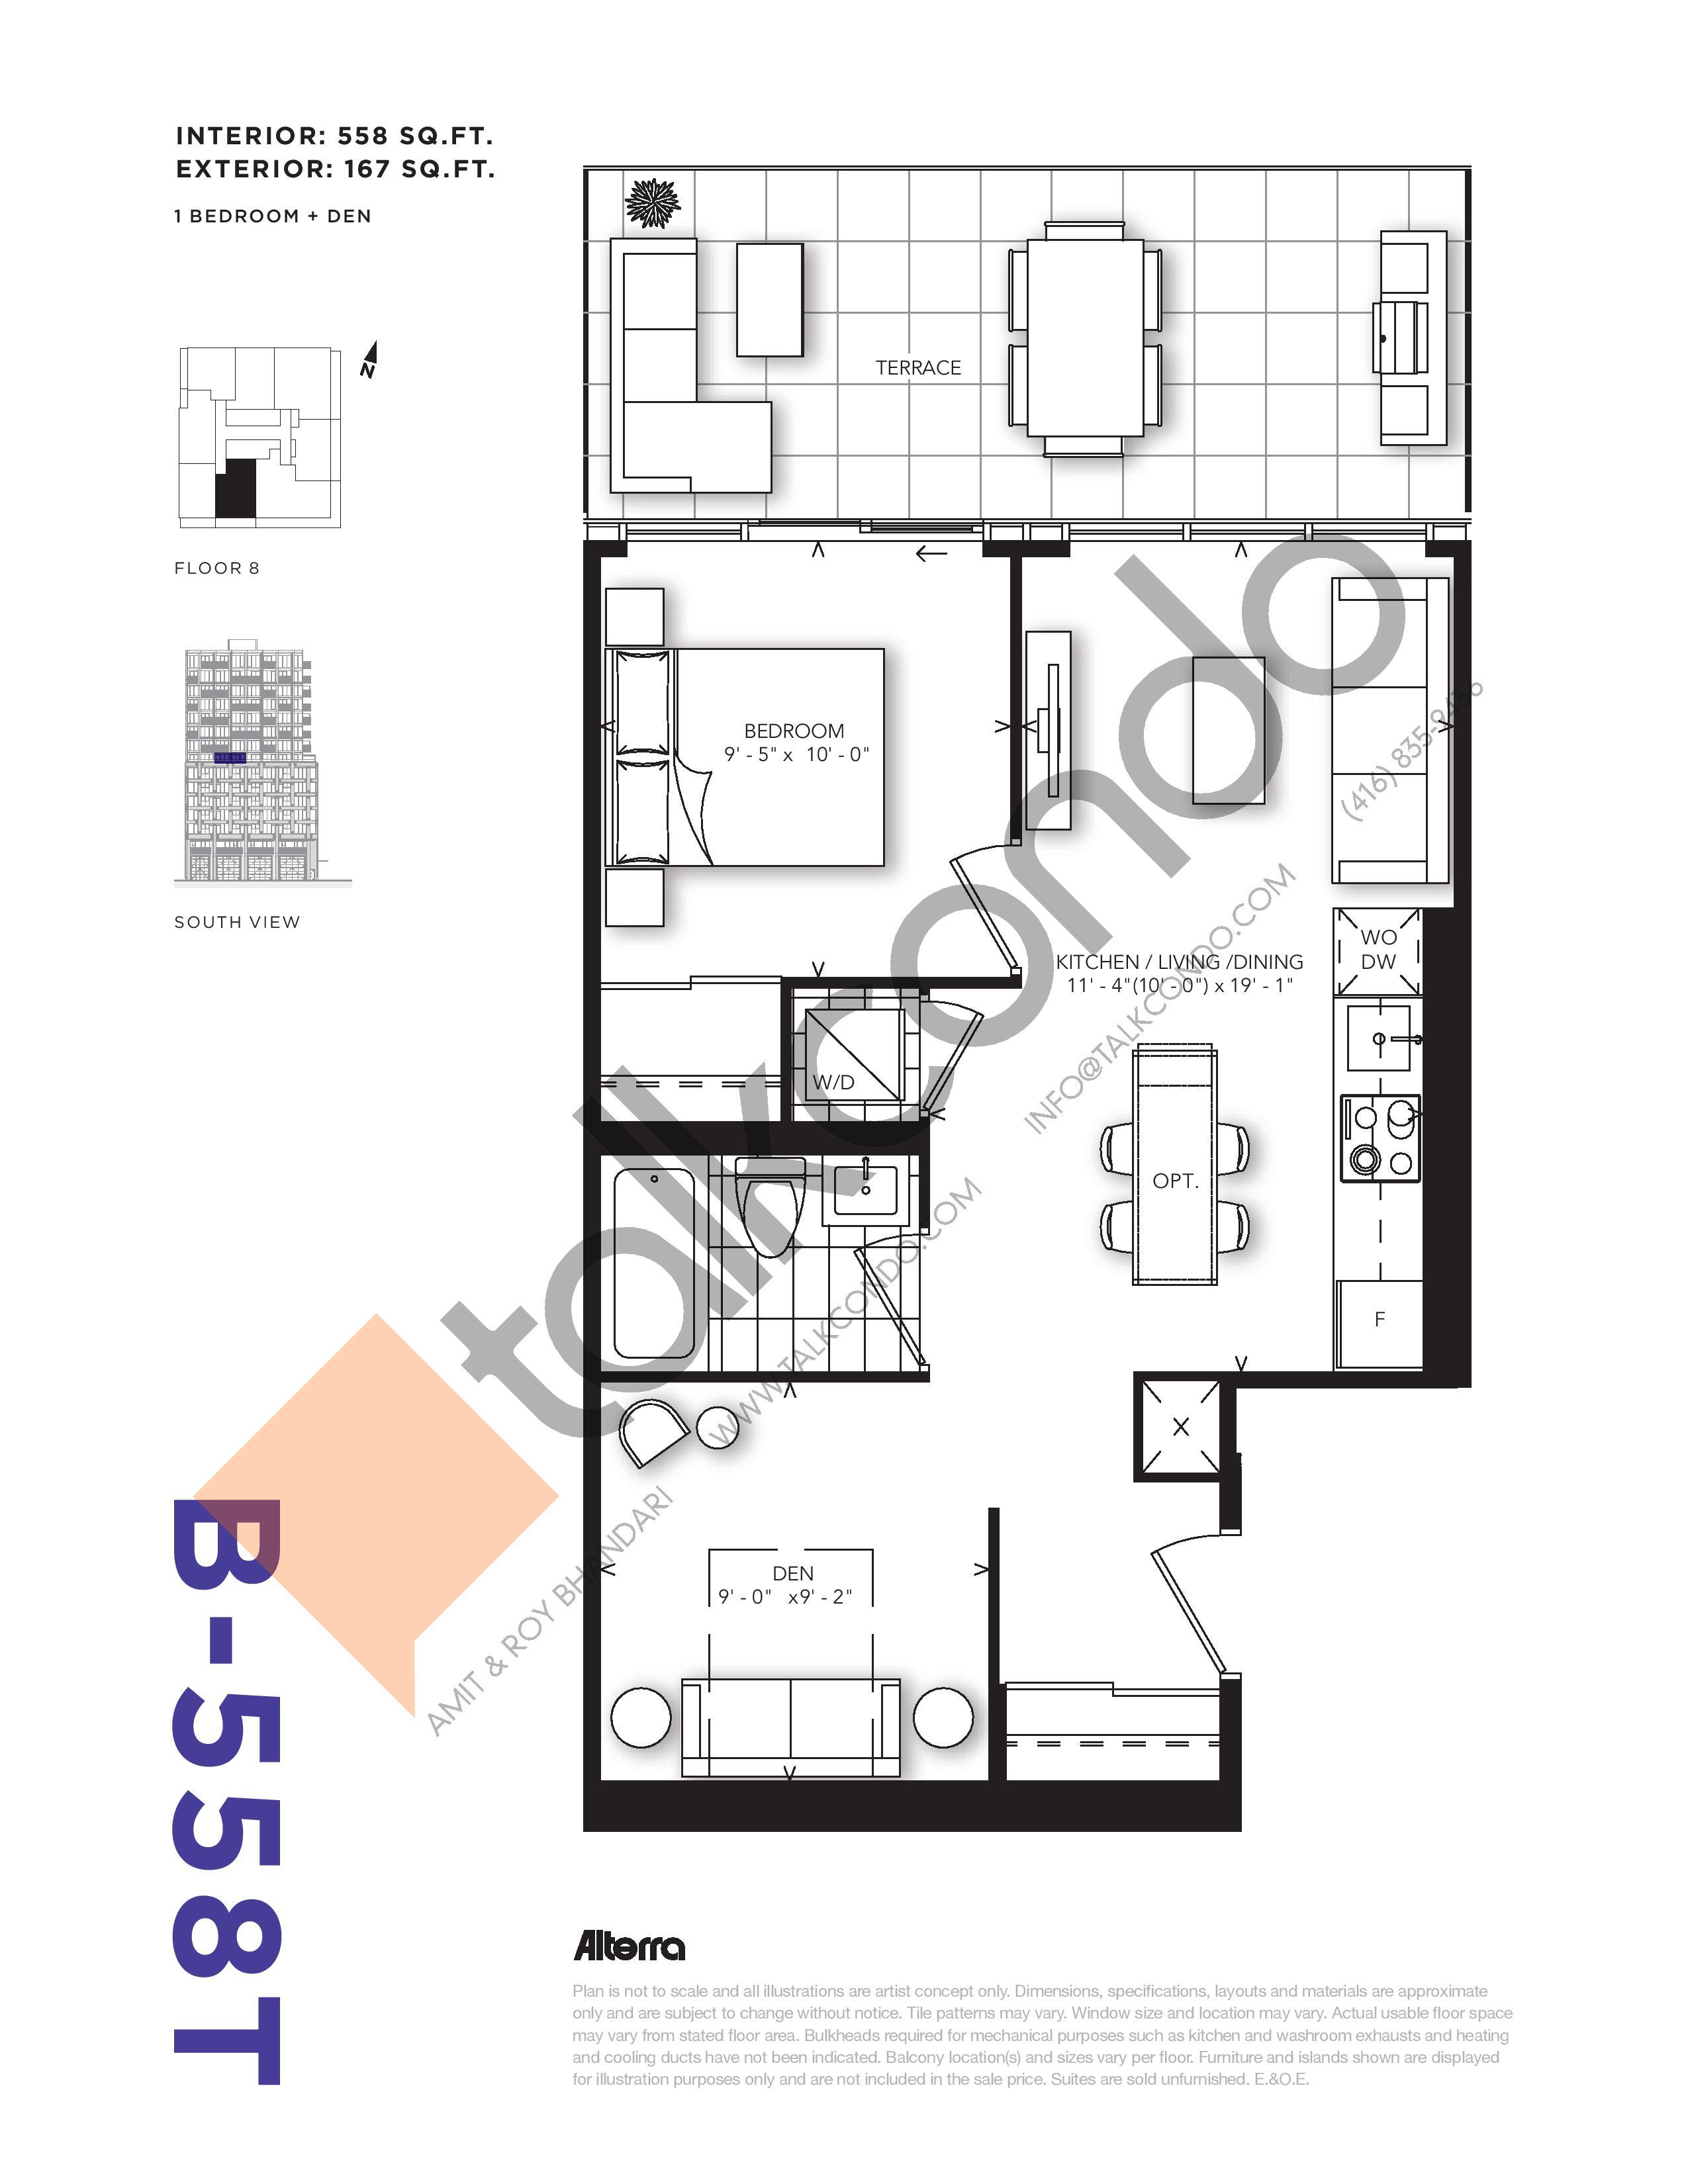 B-558T Floor Plan at RUSH Condos - 558 sq.ft